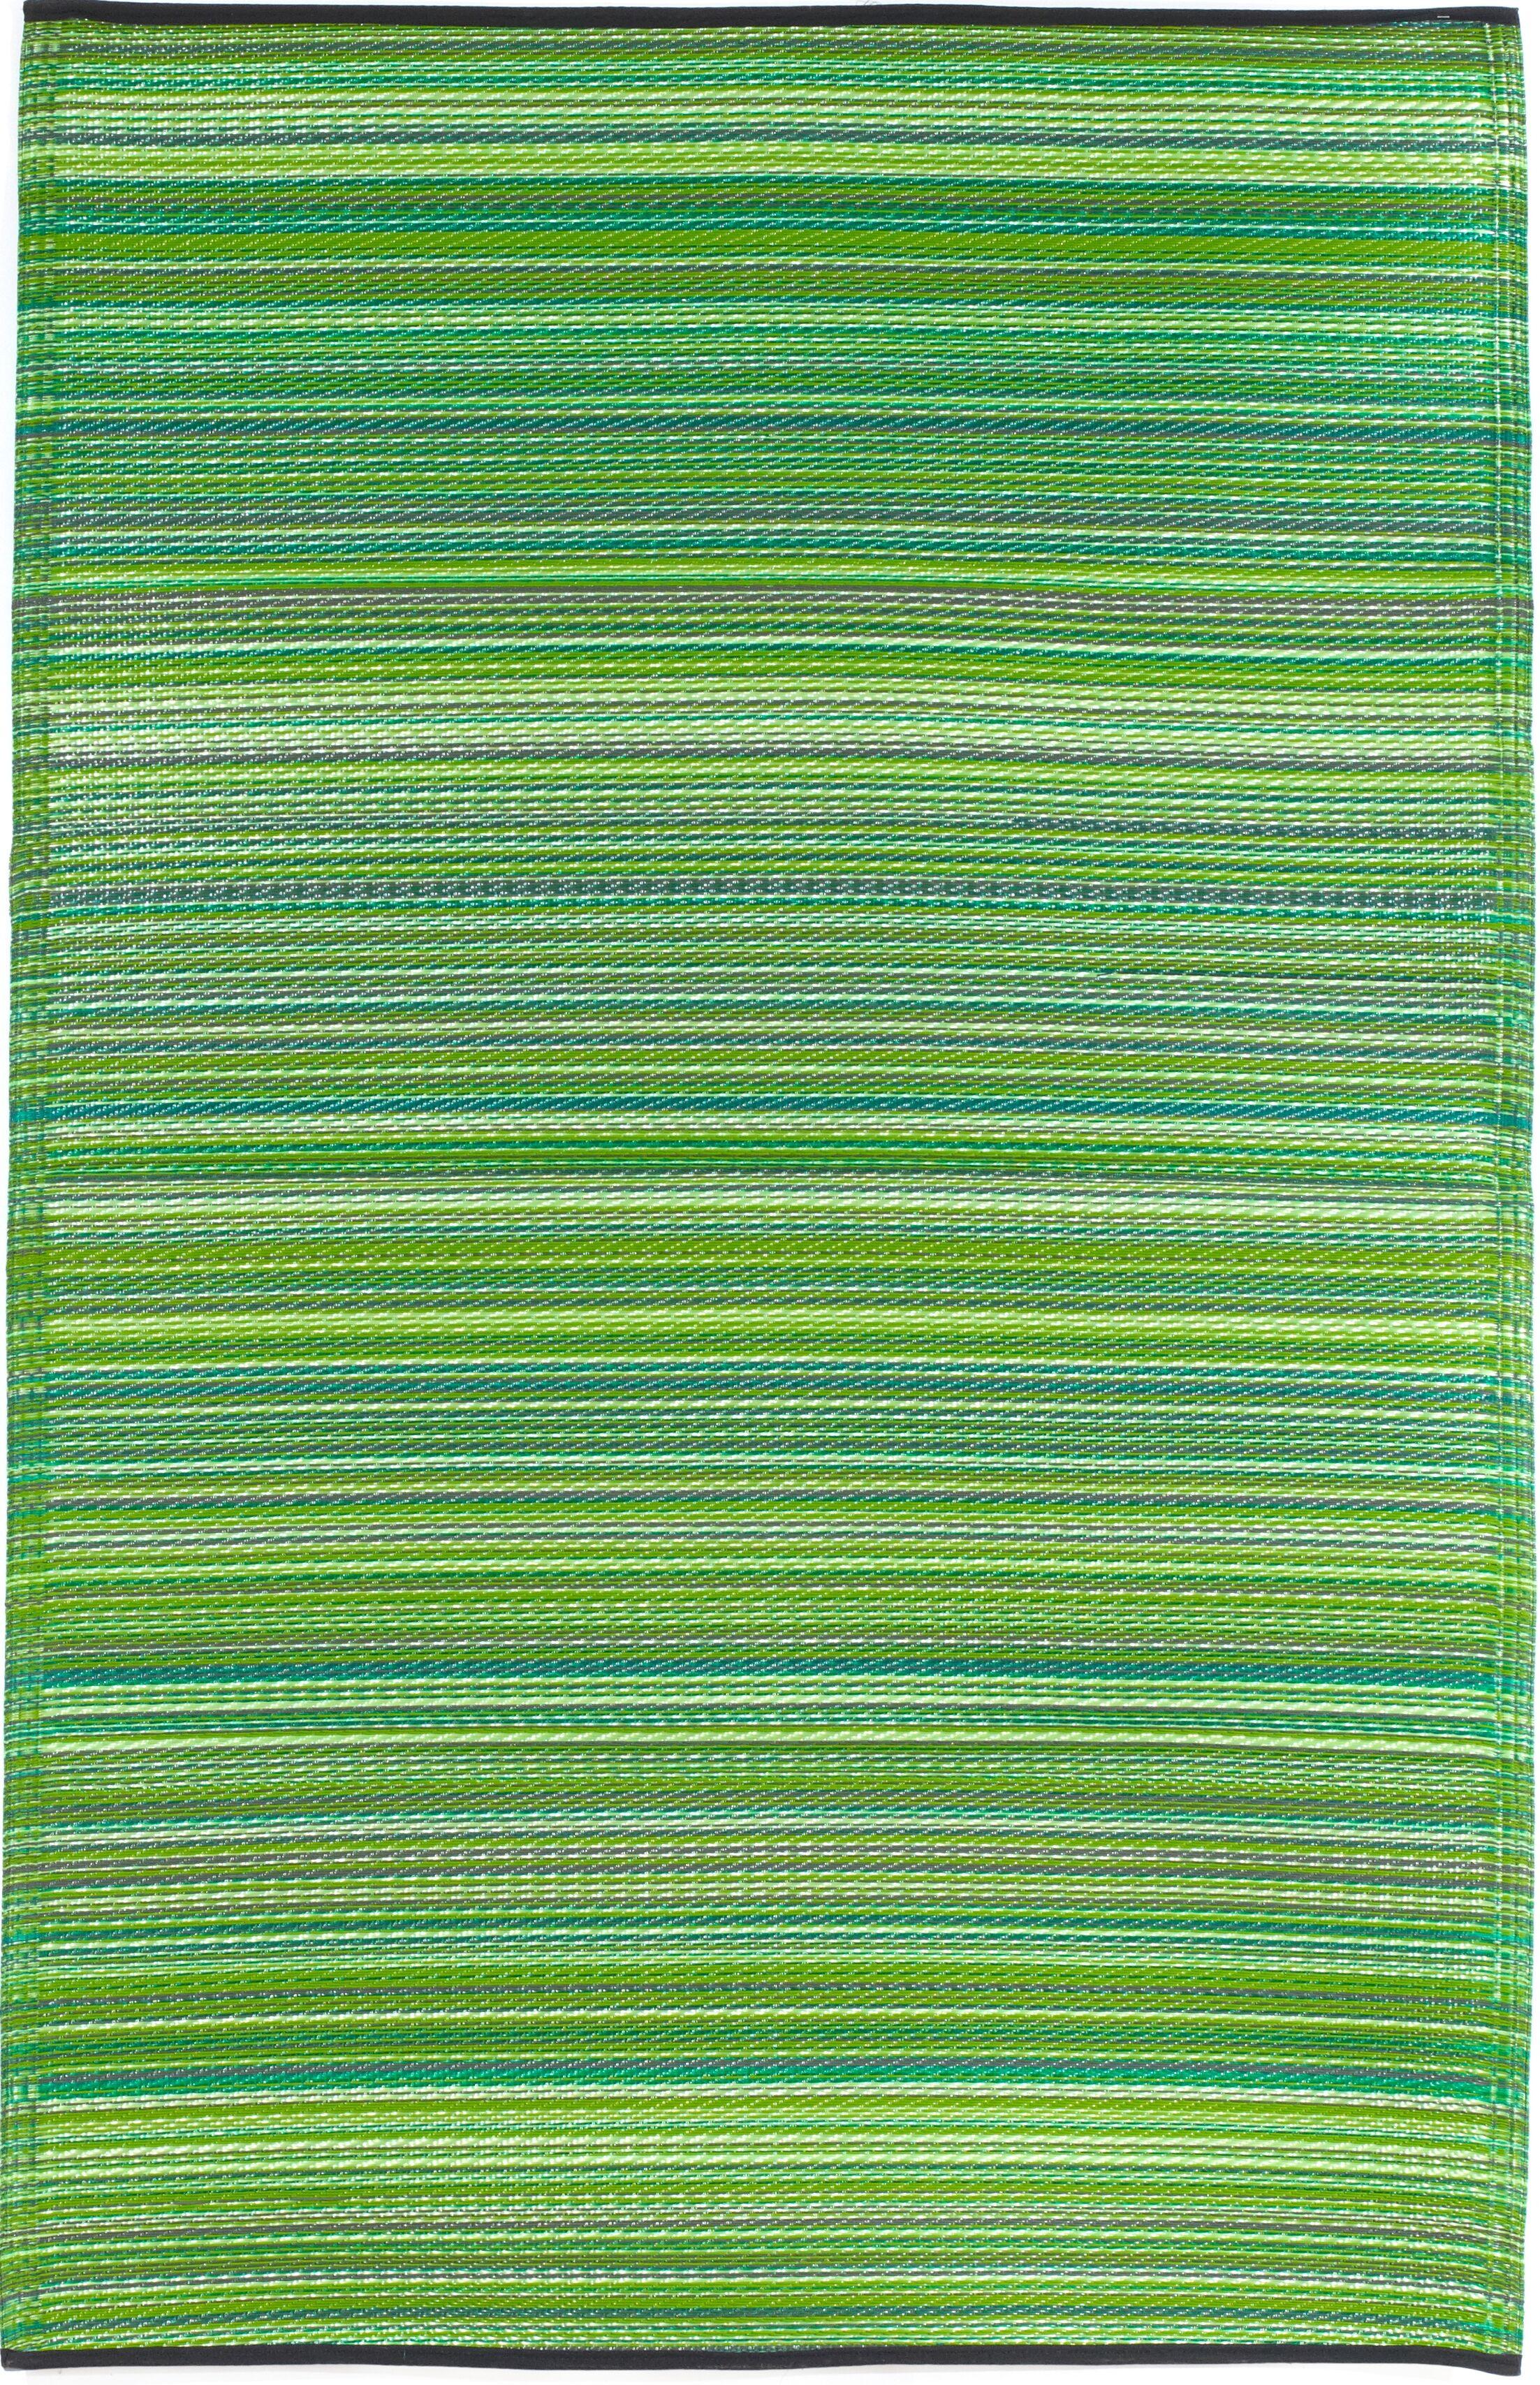 Raub Hand-Woven Green Indoor/Outdoor Area Rug Rug Size: Rectangle 5' x 8'